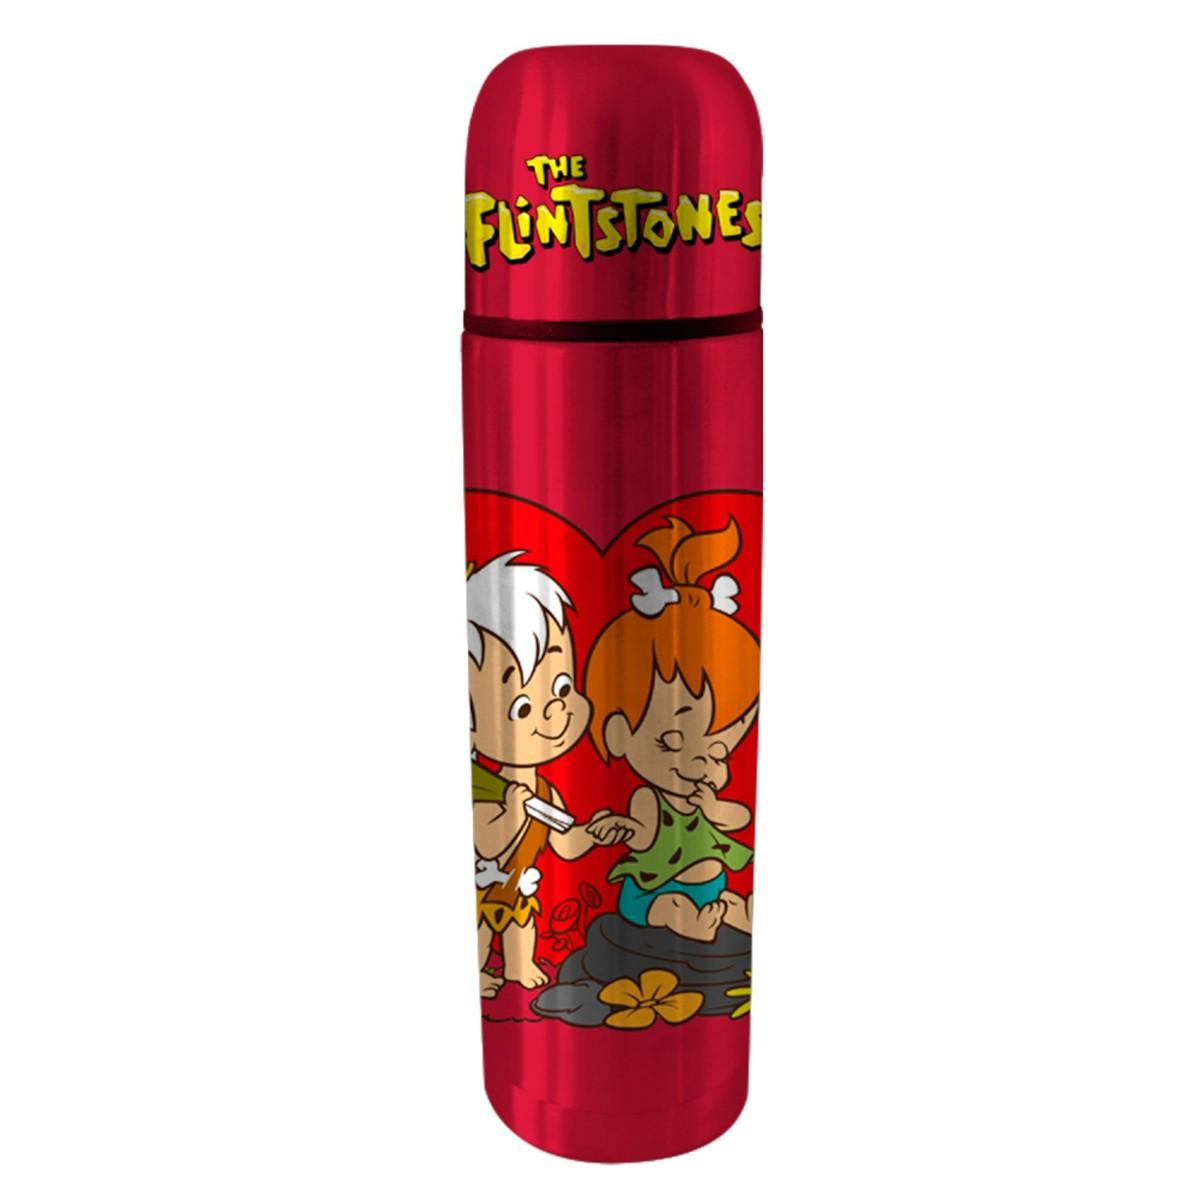 Garrafa Térmica Os Flintstones Pedrita e Bam Bam